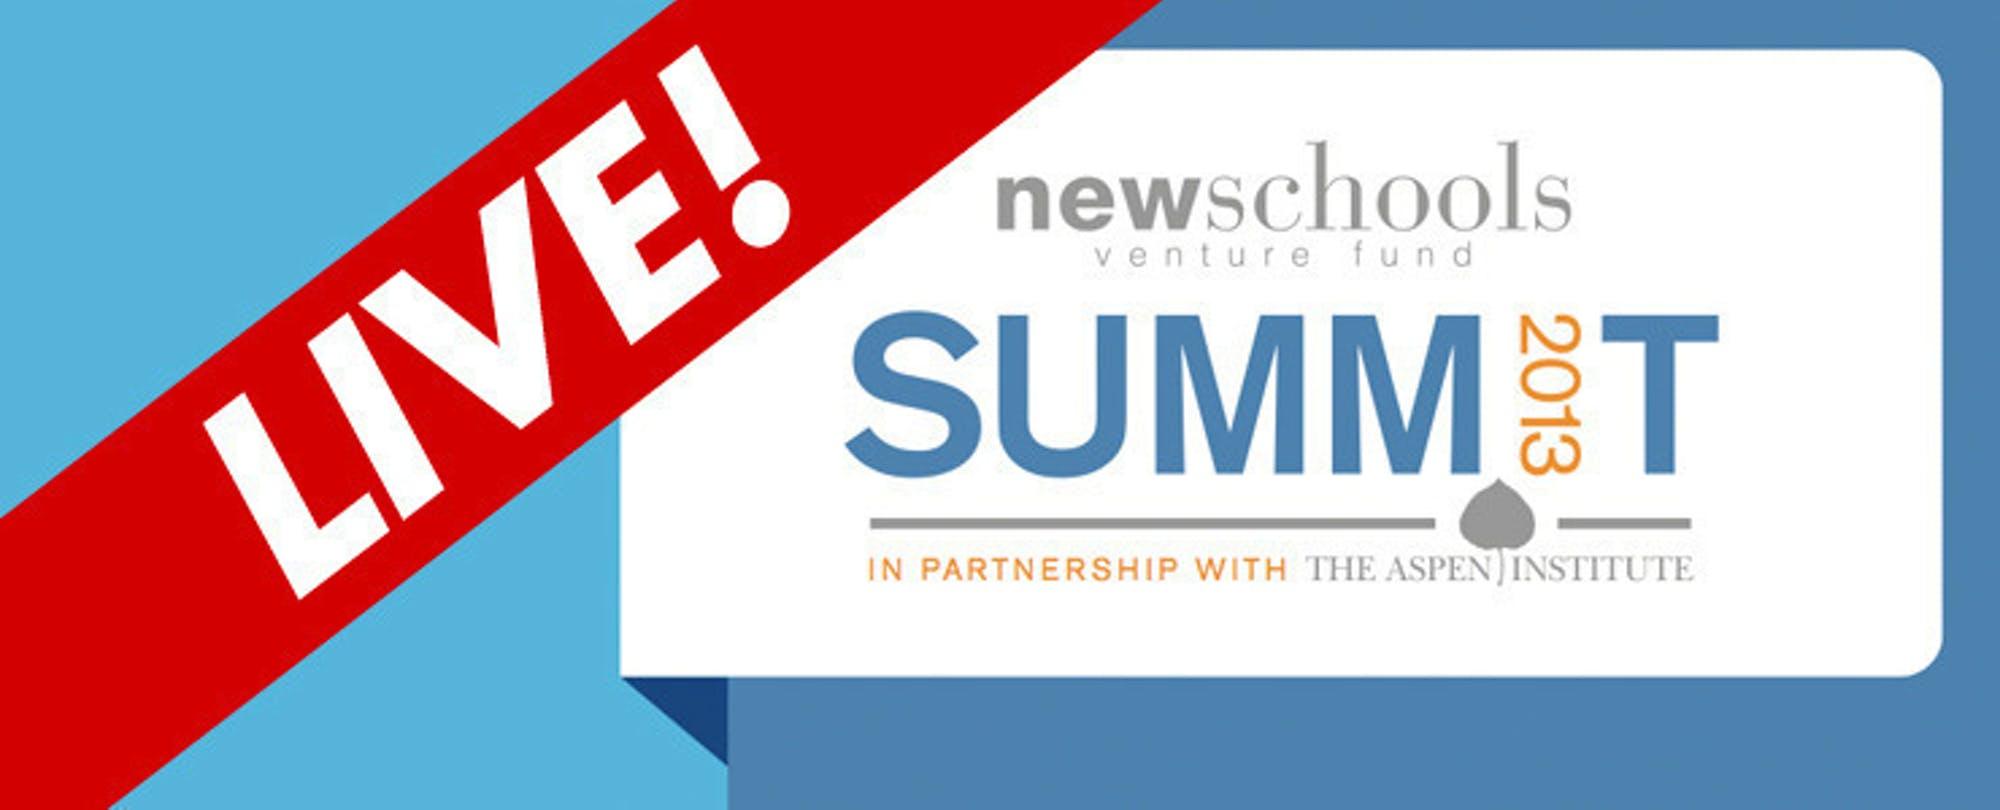 NewSchools Summit 2013 - LIVE on May 1st